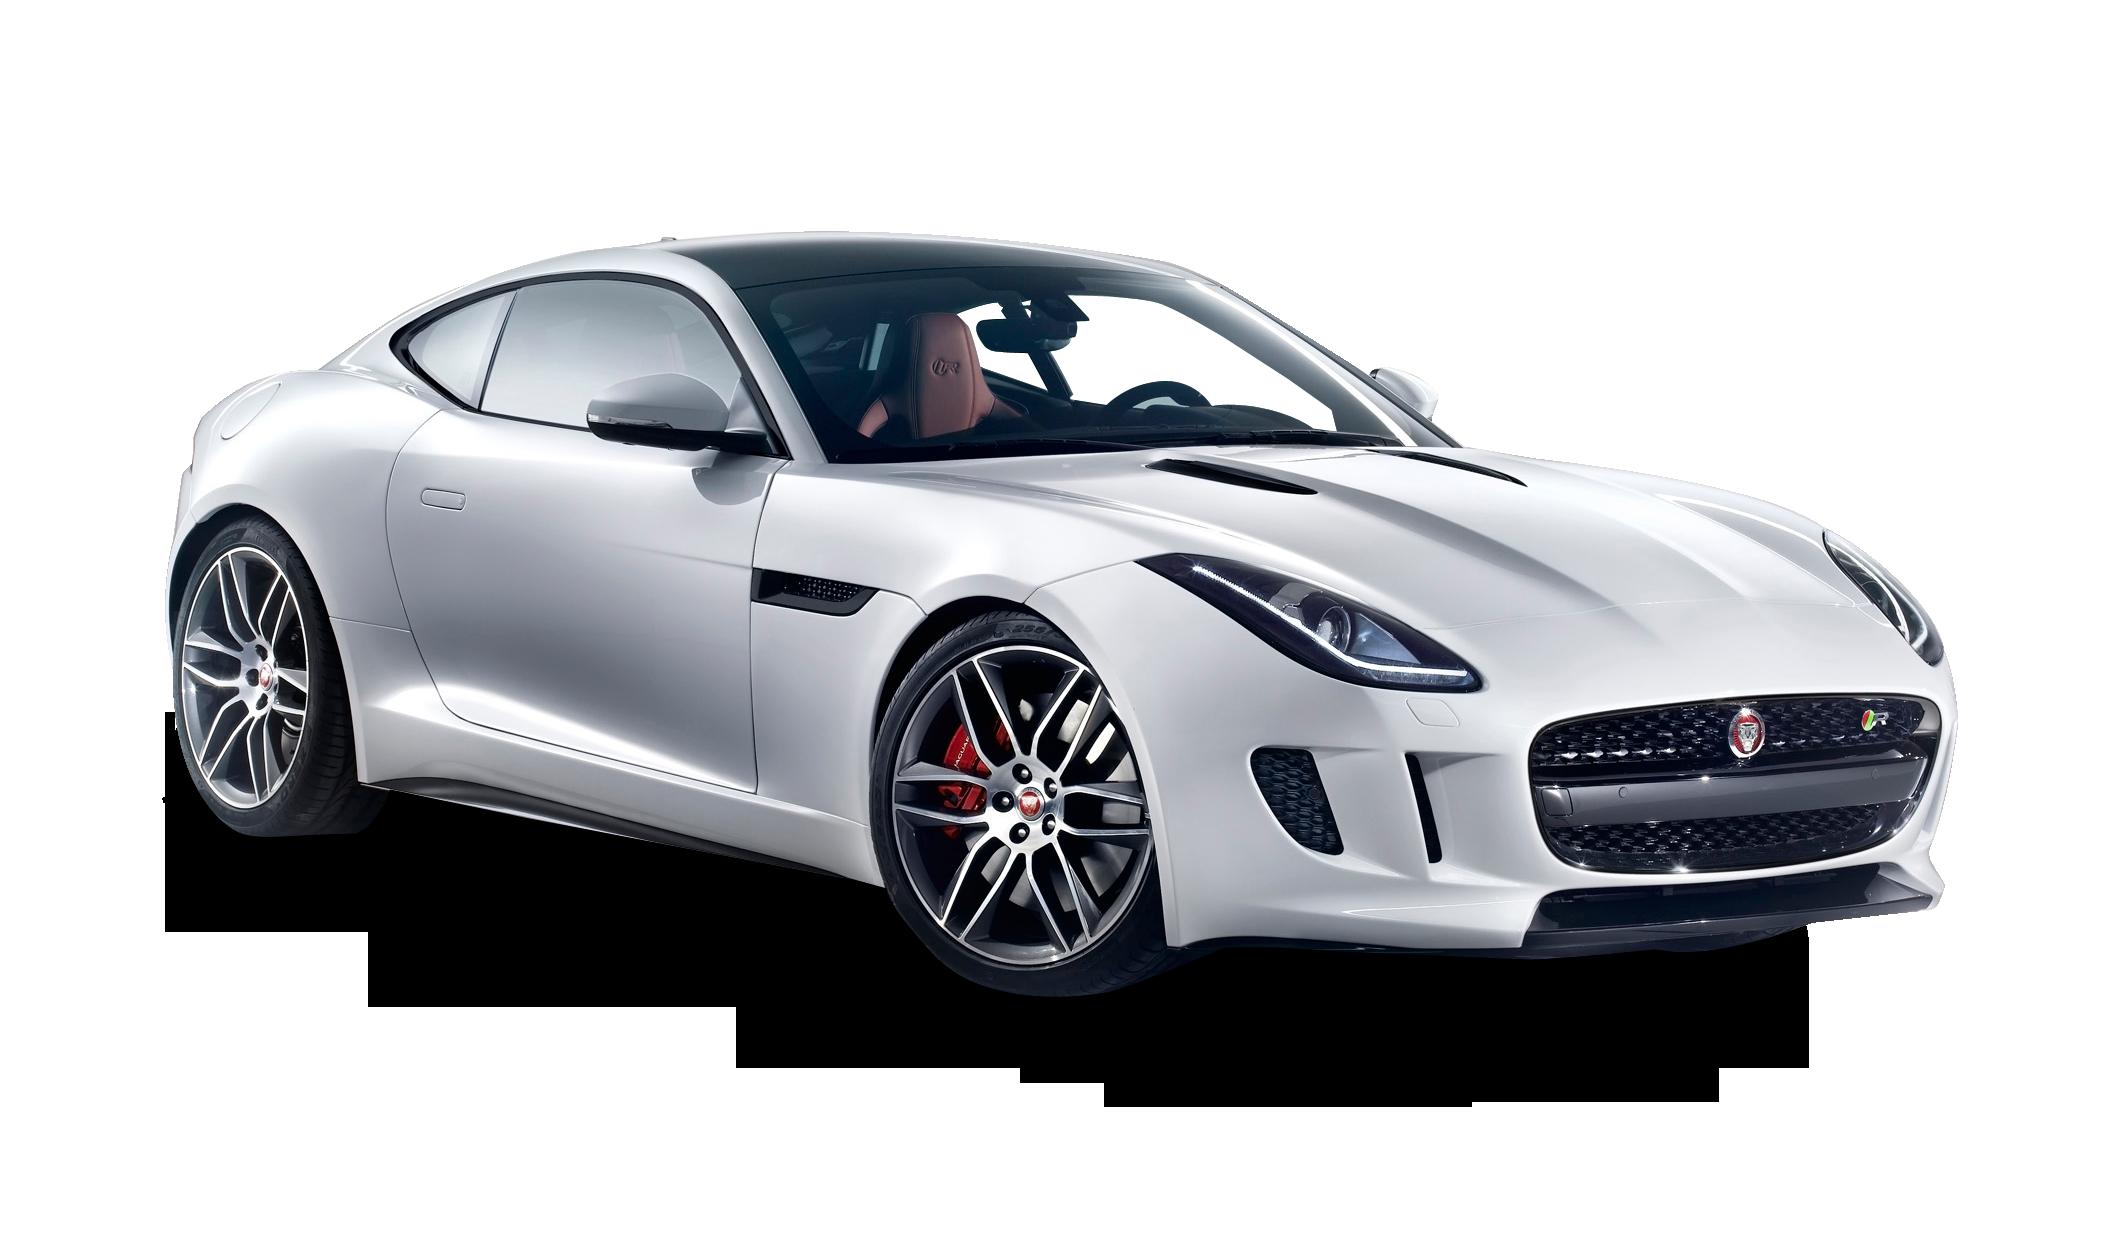 Jaguar F TYPE Car PNG Image.